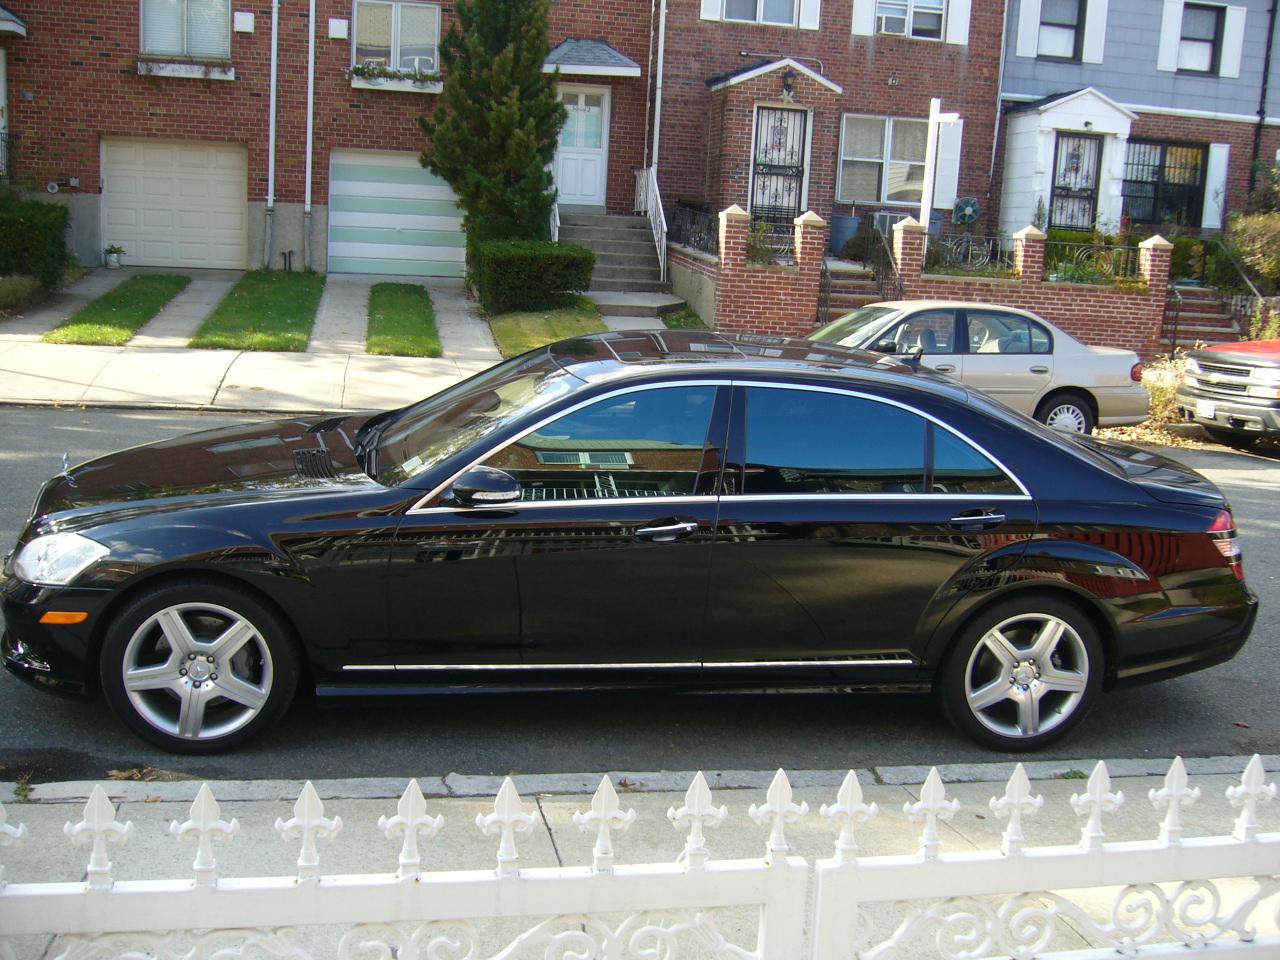 Mercedes benz s550 4matic photos reviews news specs for Buy a mercedes benz